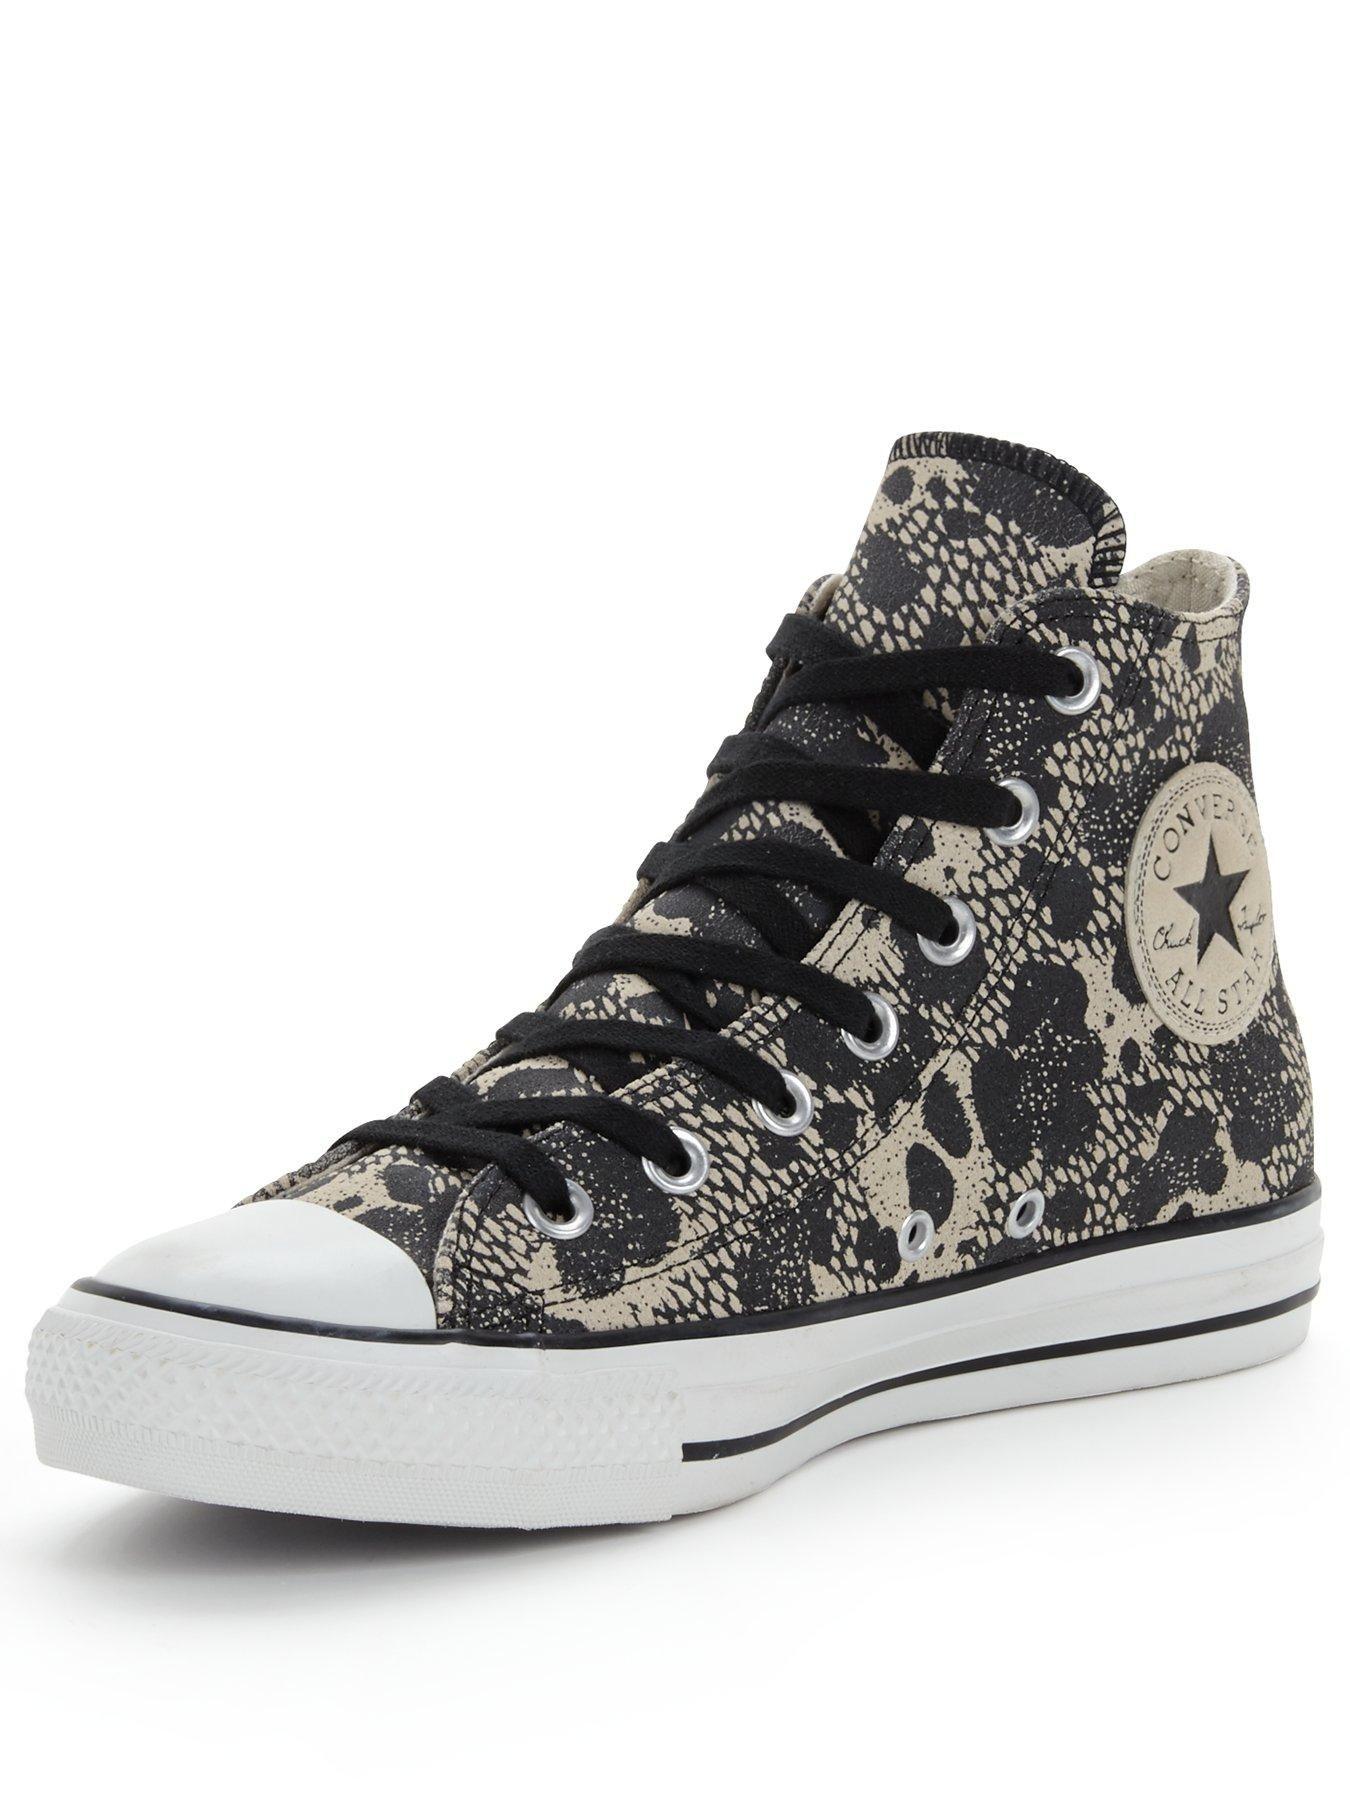 Køb Af Converse Cons One Star Pro Rub off Læder Lav | Nike